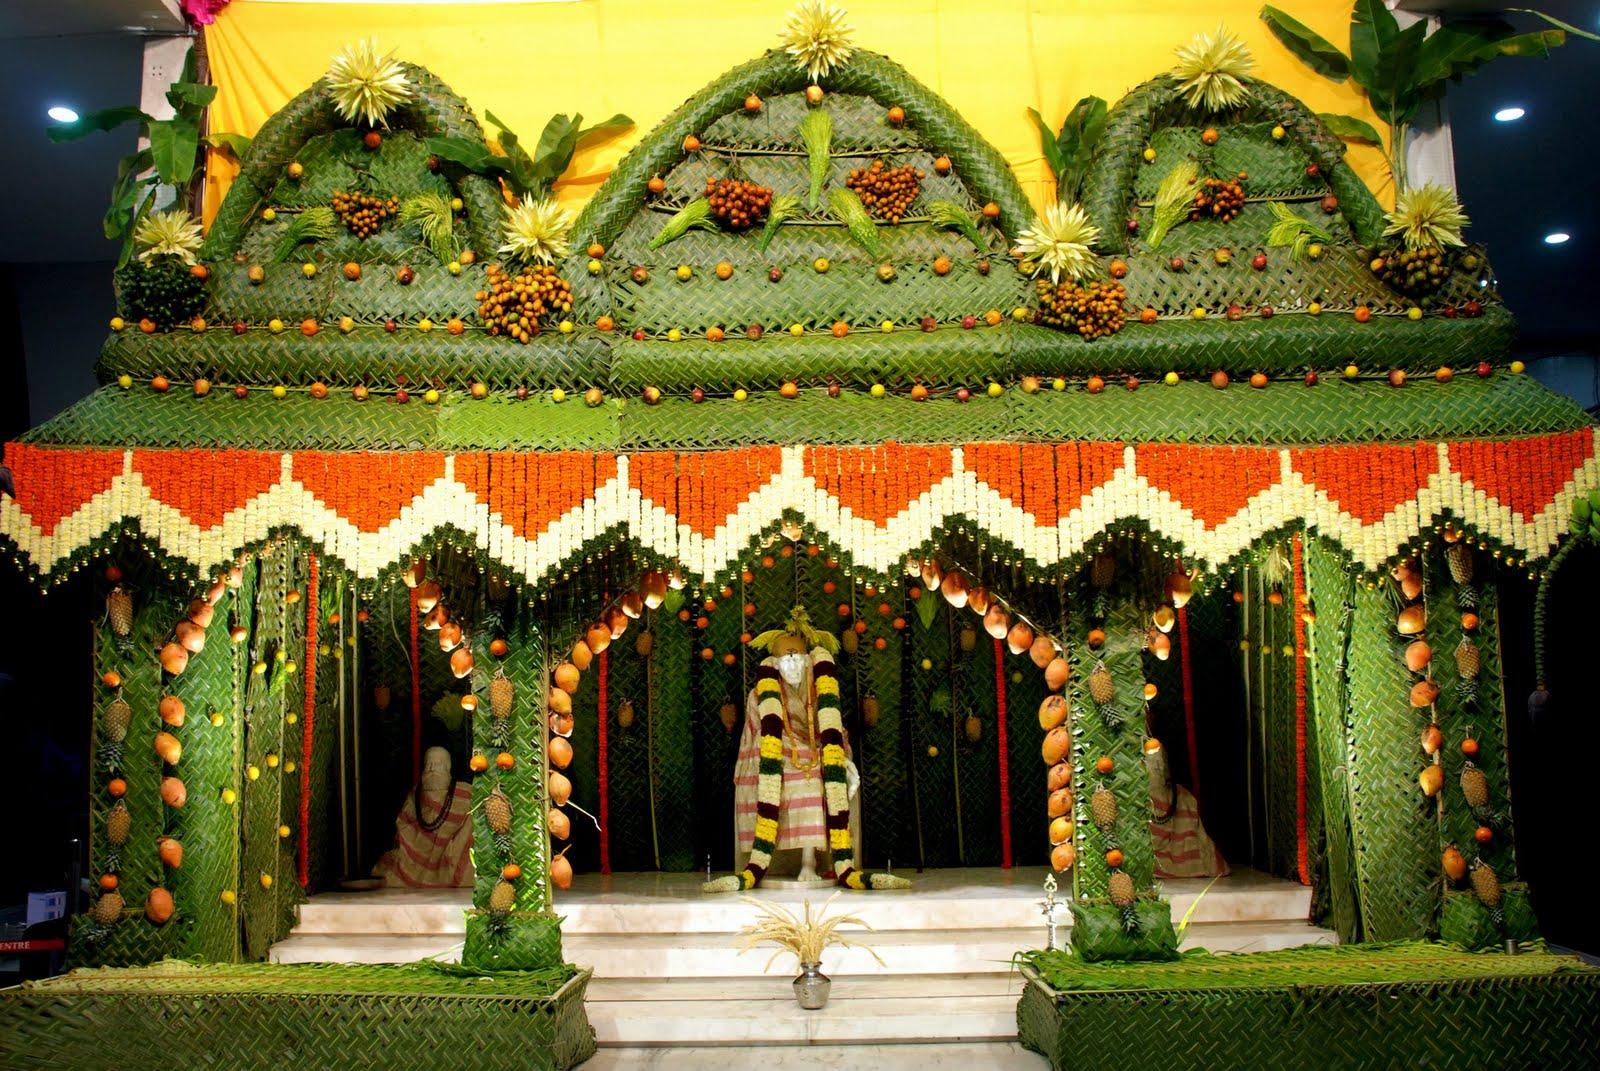 Wallpaper home decor india starfruit flavor tasters http1bpspot 9esxoesevkatw5hmcegwsi junglespirit Image collections